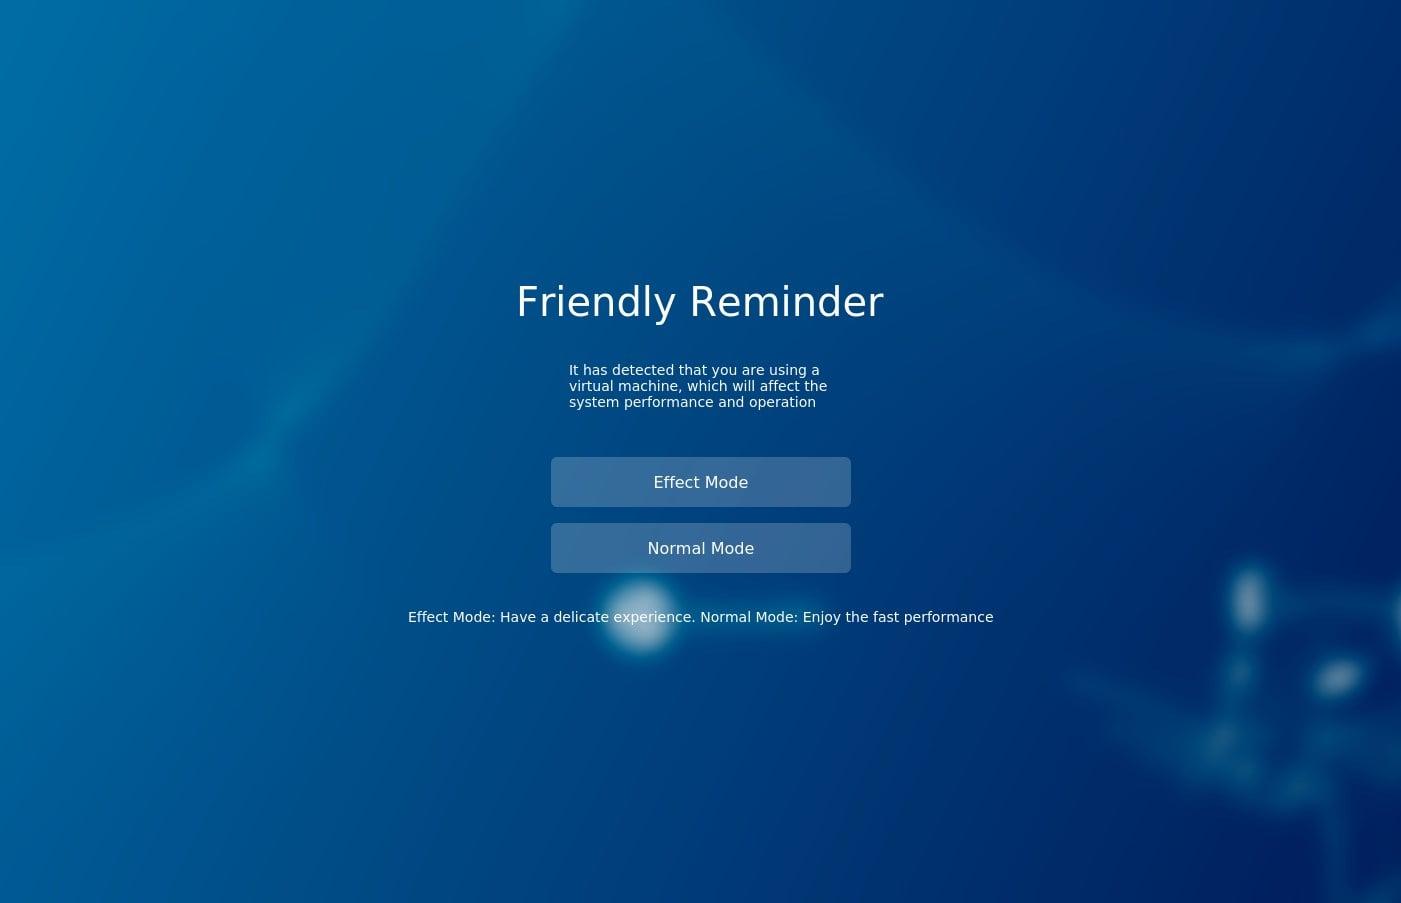 Effect or Normal mode setup of Ubuntu 20.04 Deepin Desktop environment